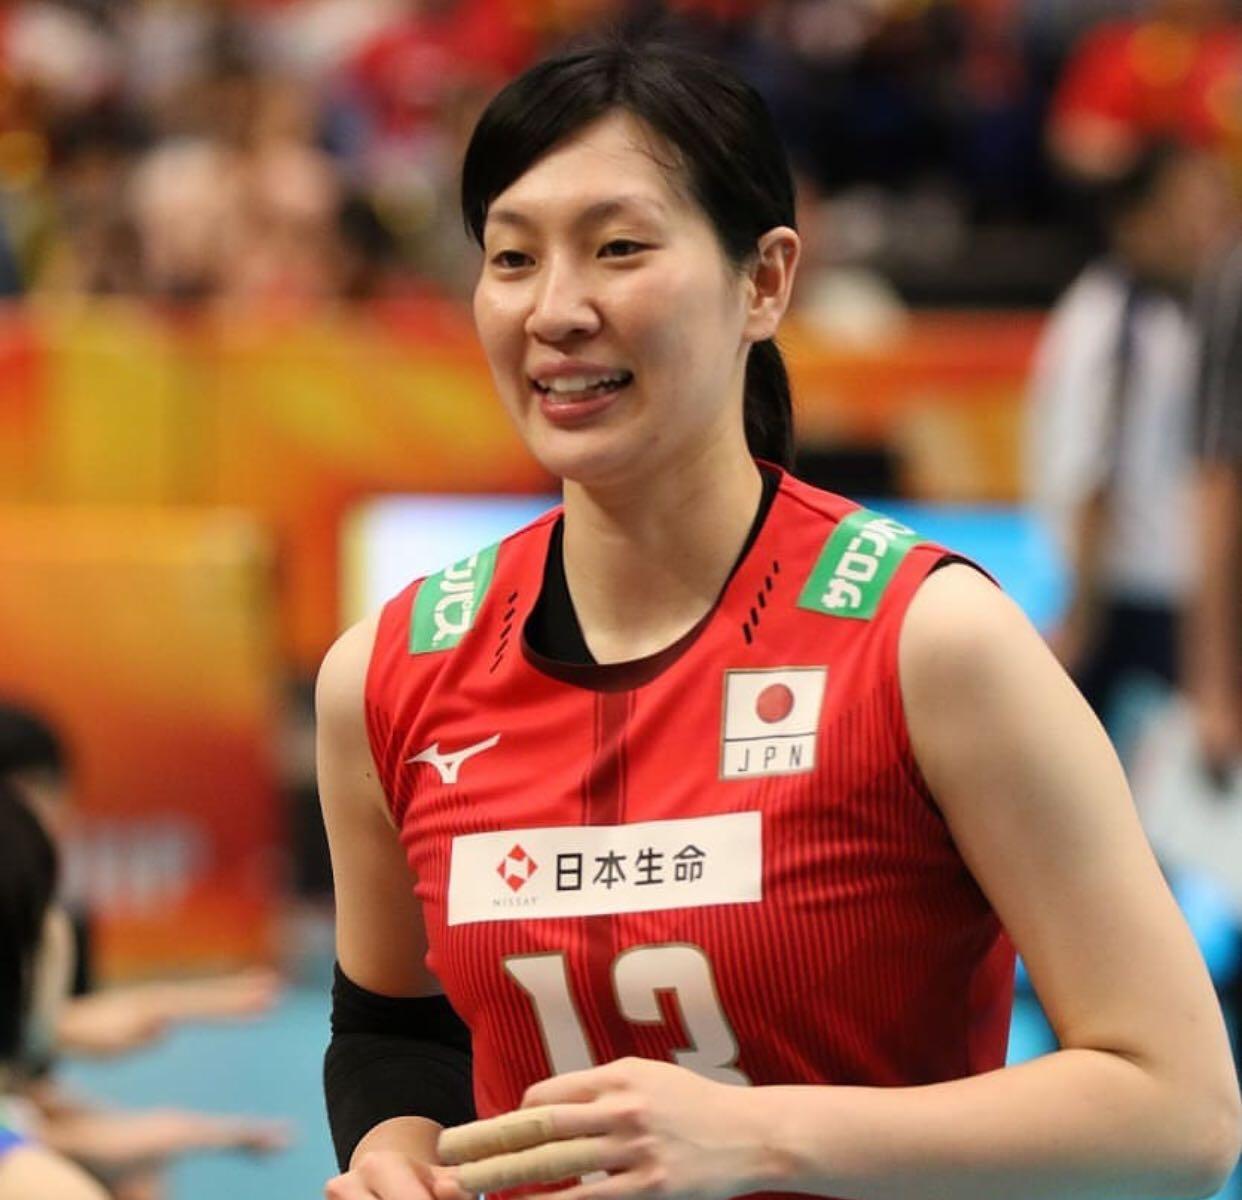 Mai Okumura Pemain Bola Voli Cantik Jepang Profil Atlet Olahraga Dunia